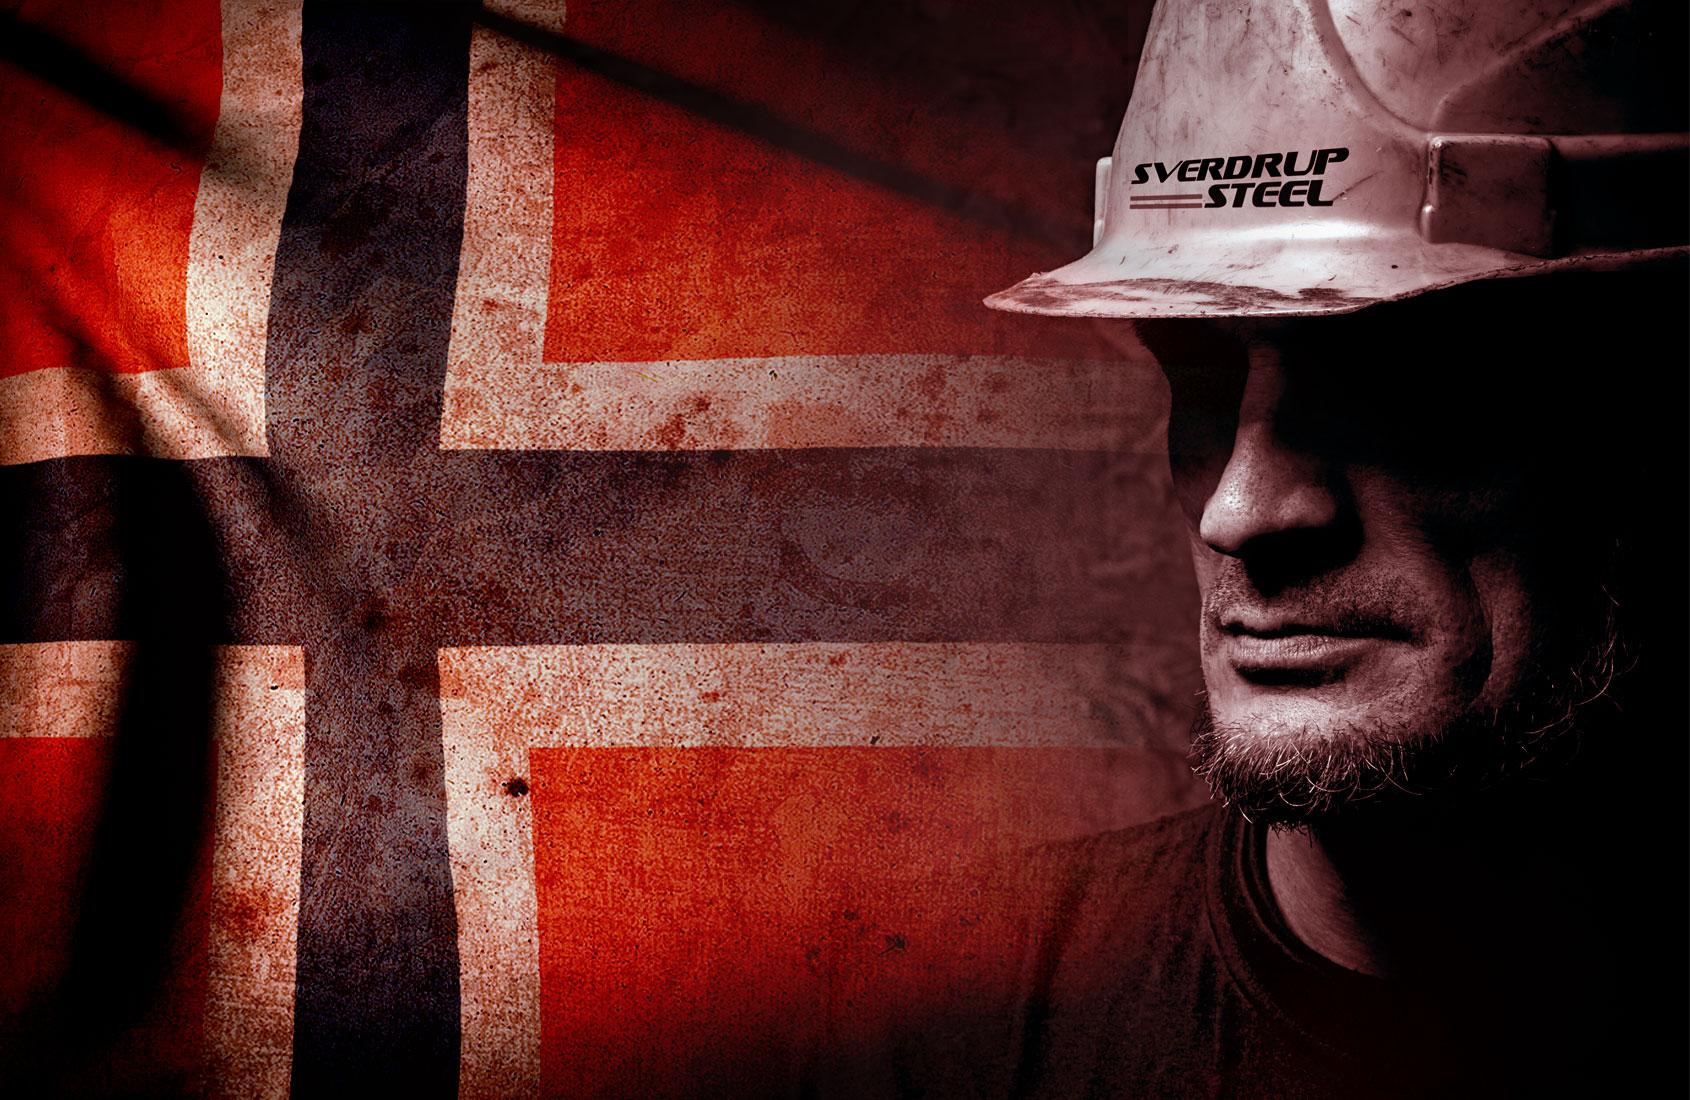 Sverdrup Steel Norway Advertising Concepts